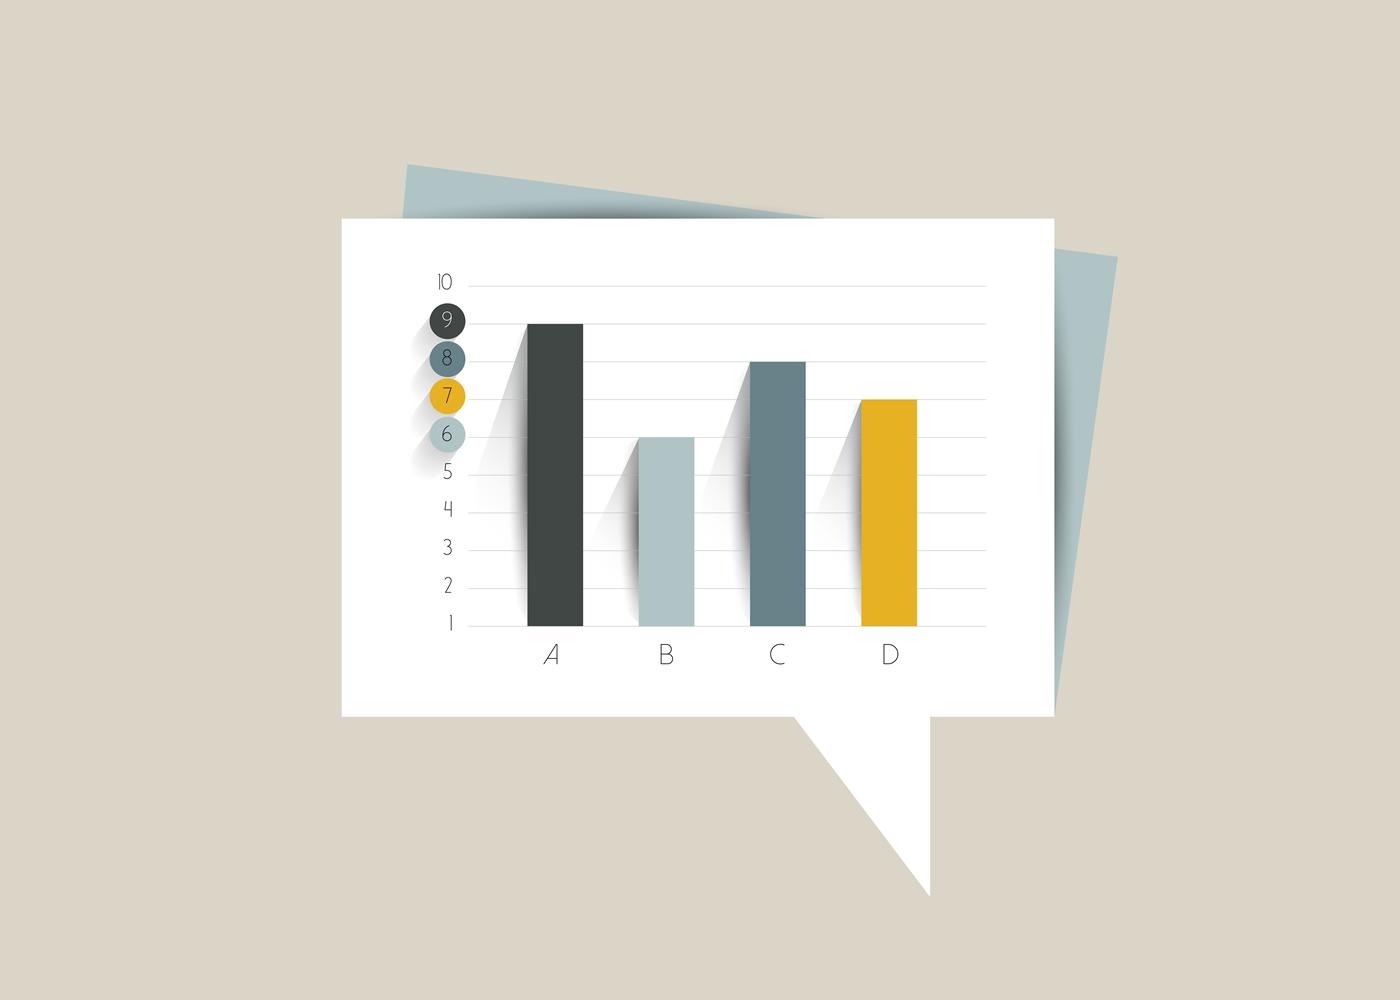 naem-research-quickpolls-2015-06-safety-metrics-700x500